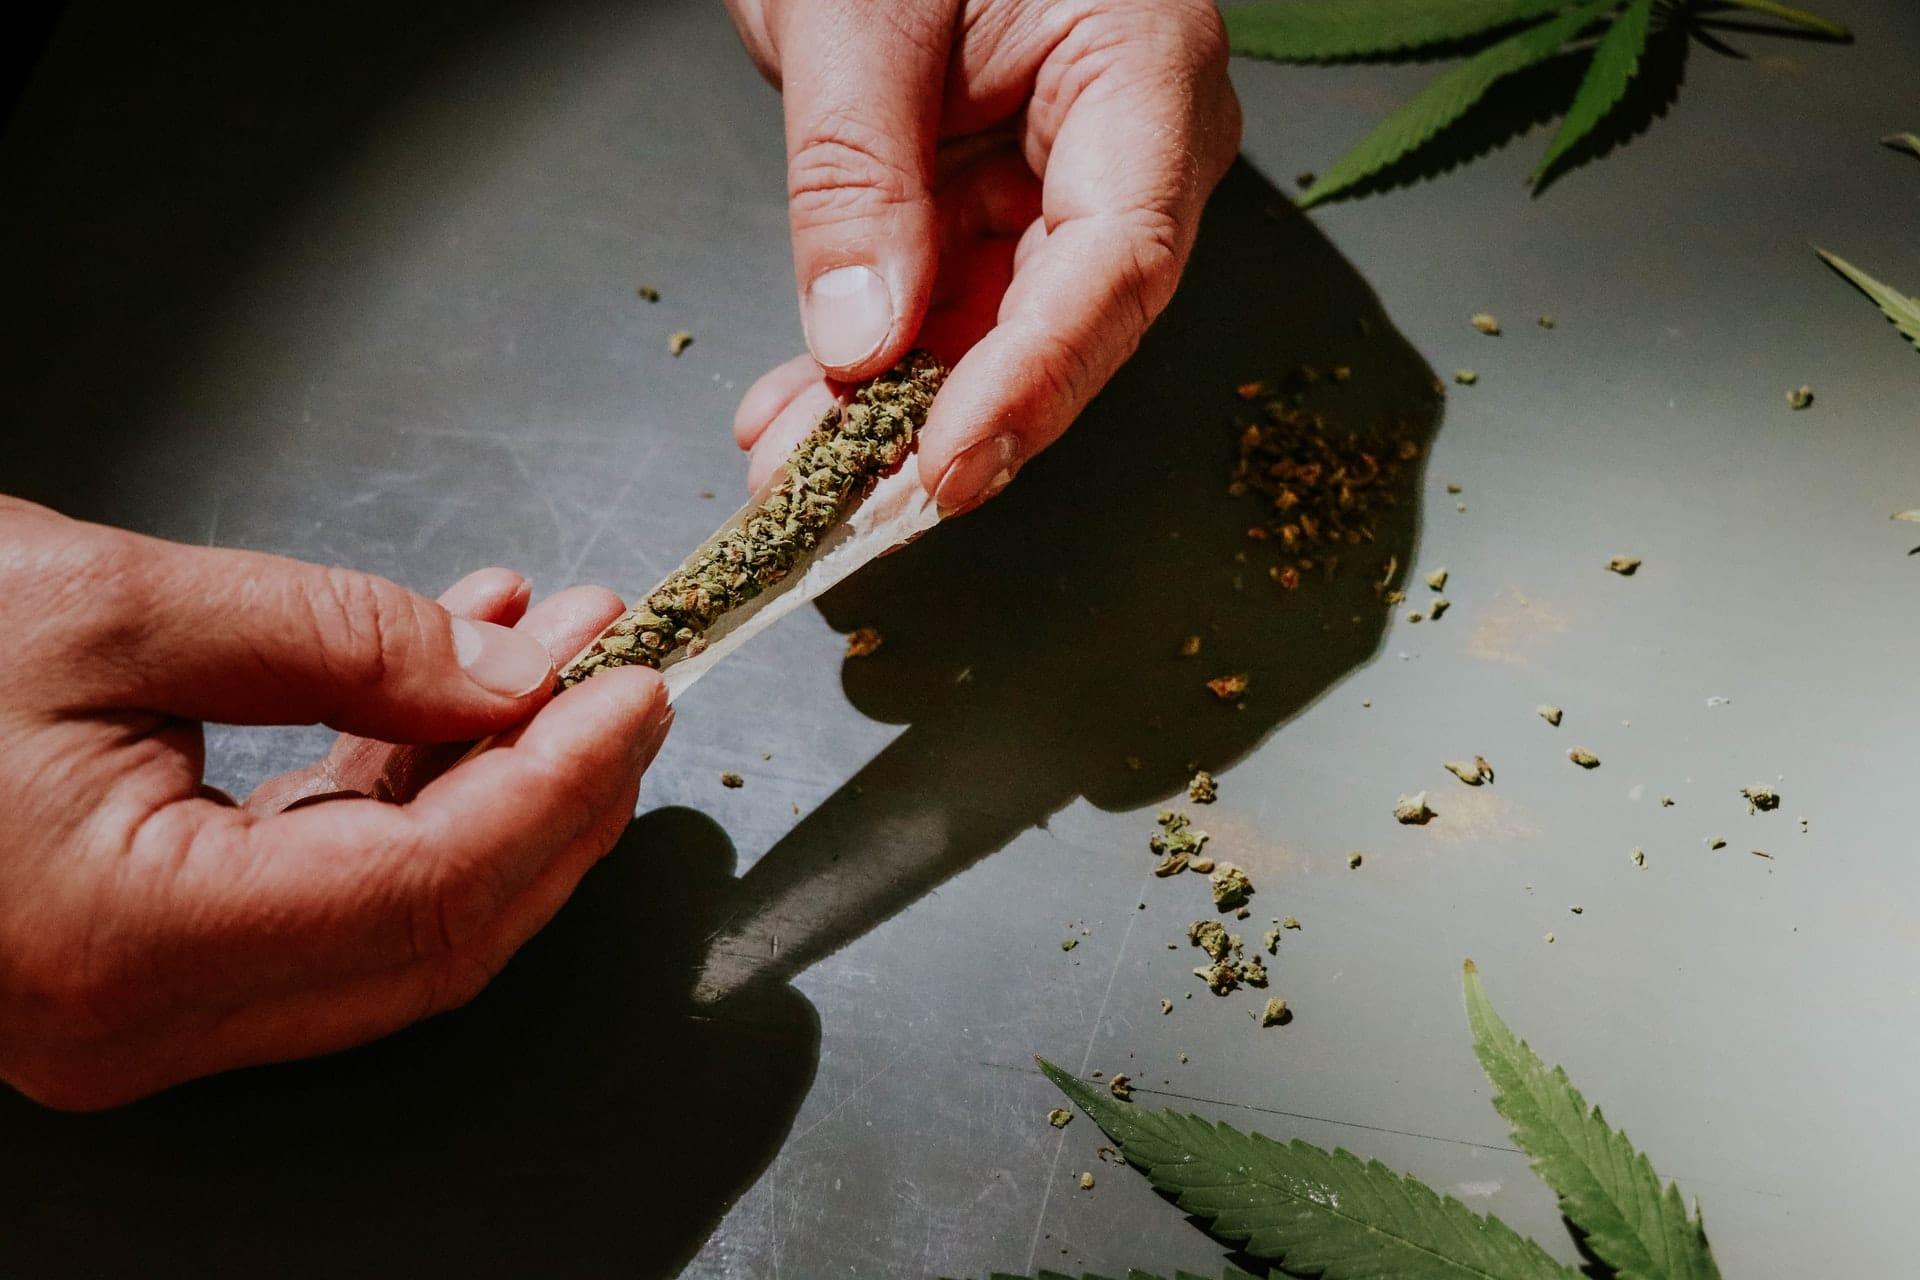 Connecticut cannabis legalization starts July 1st